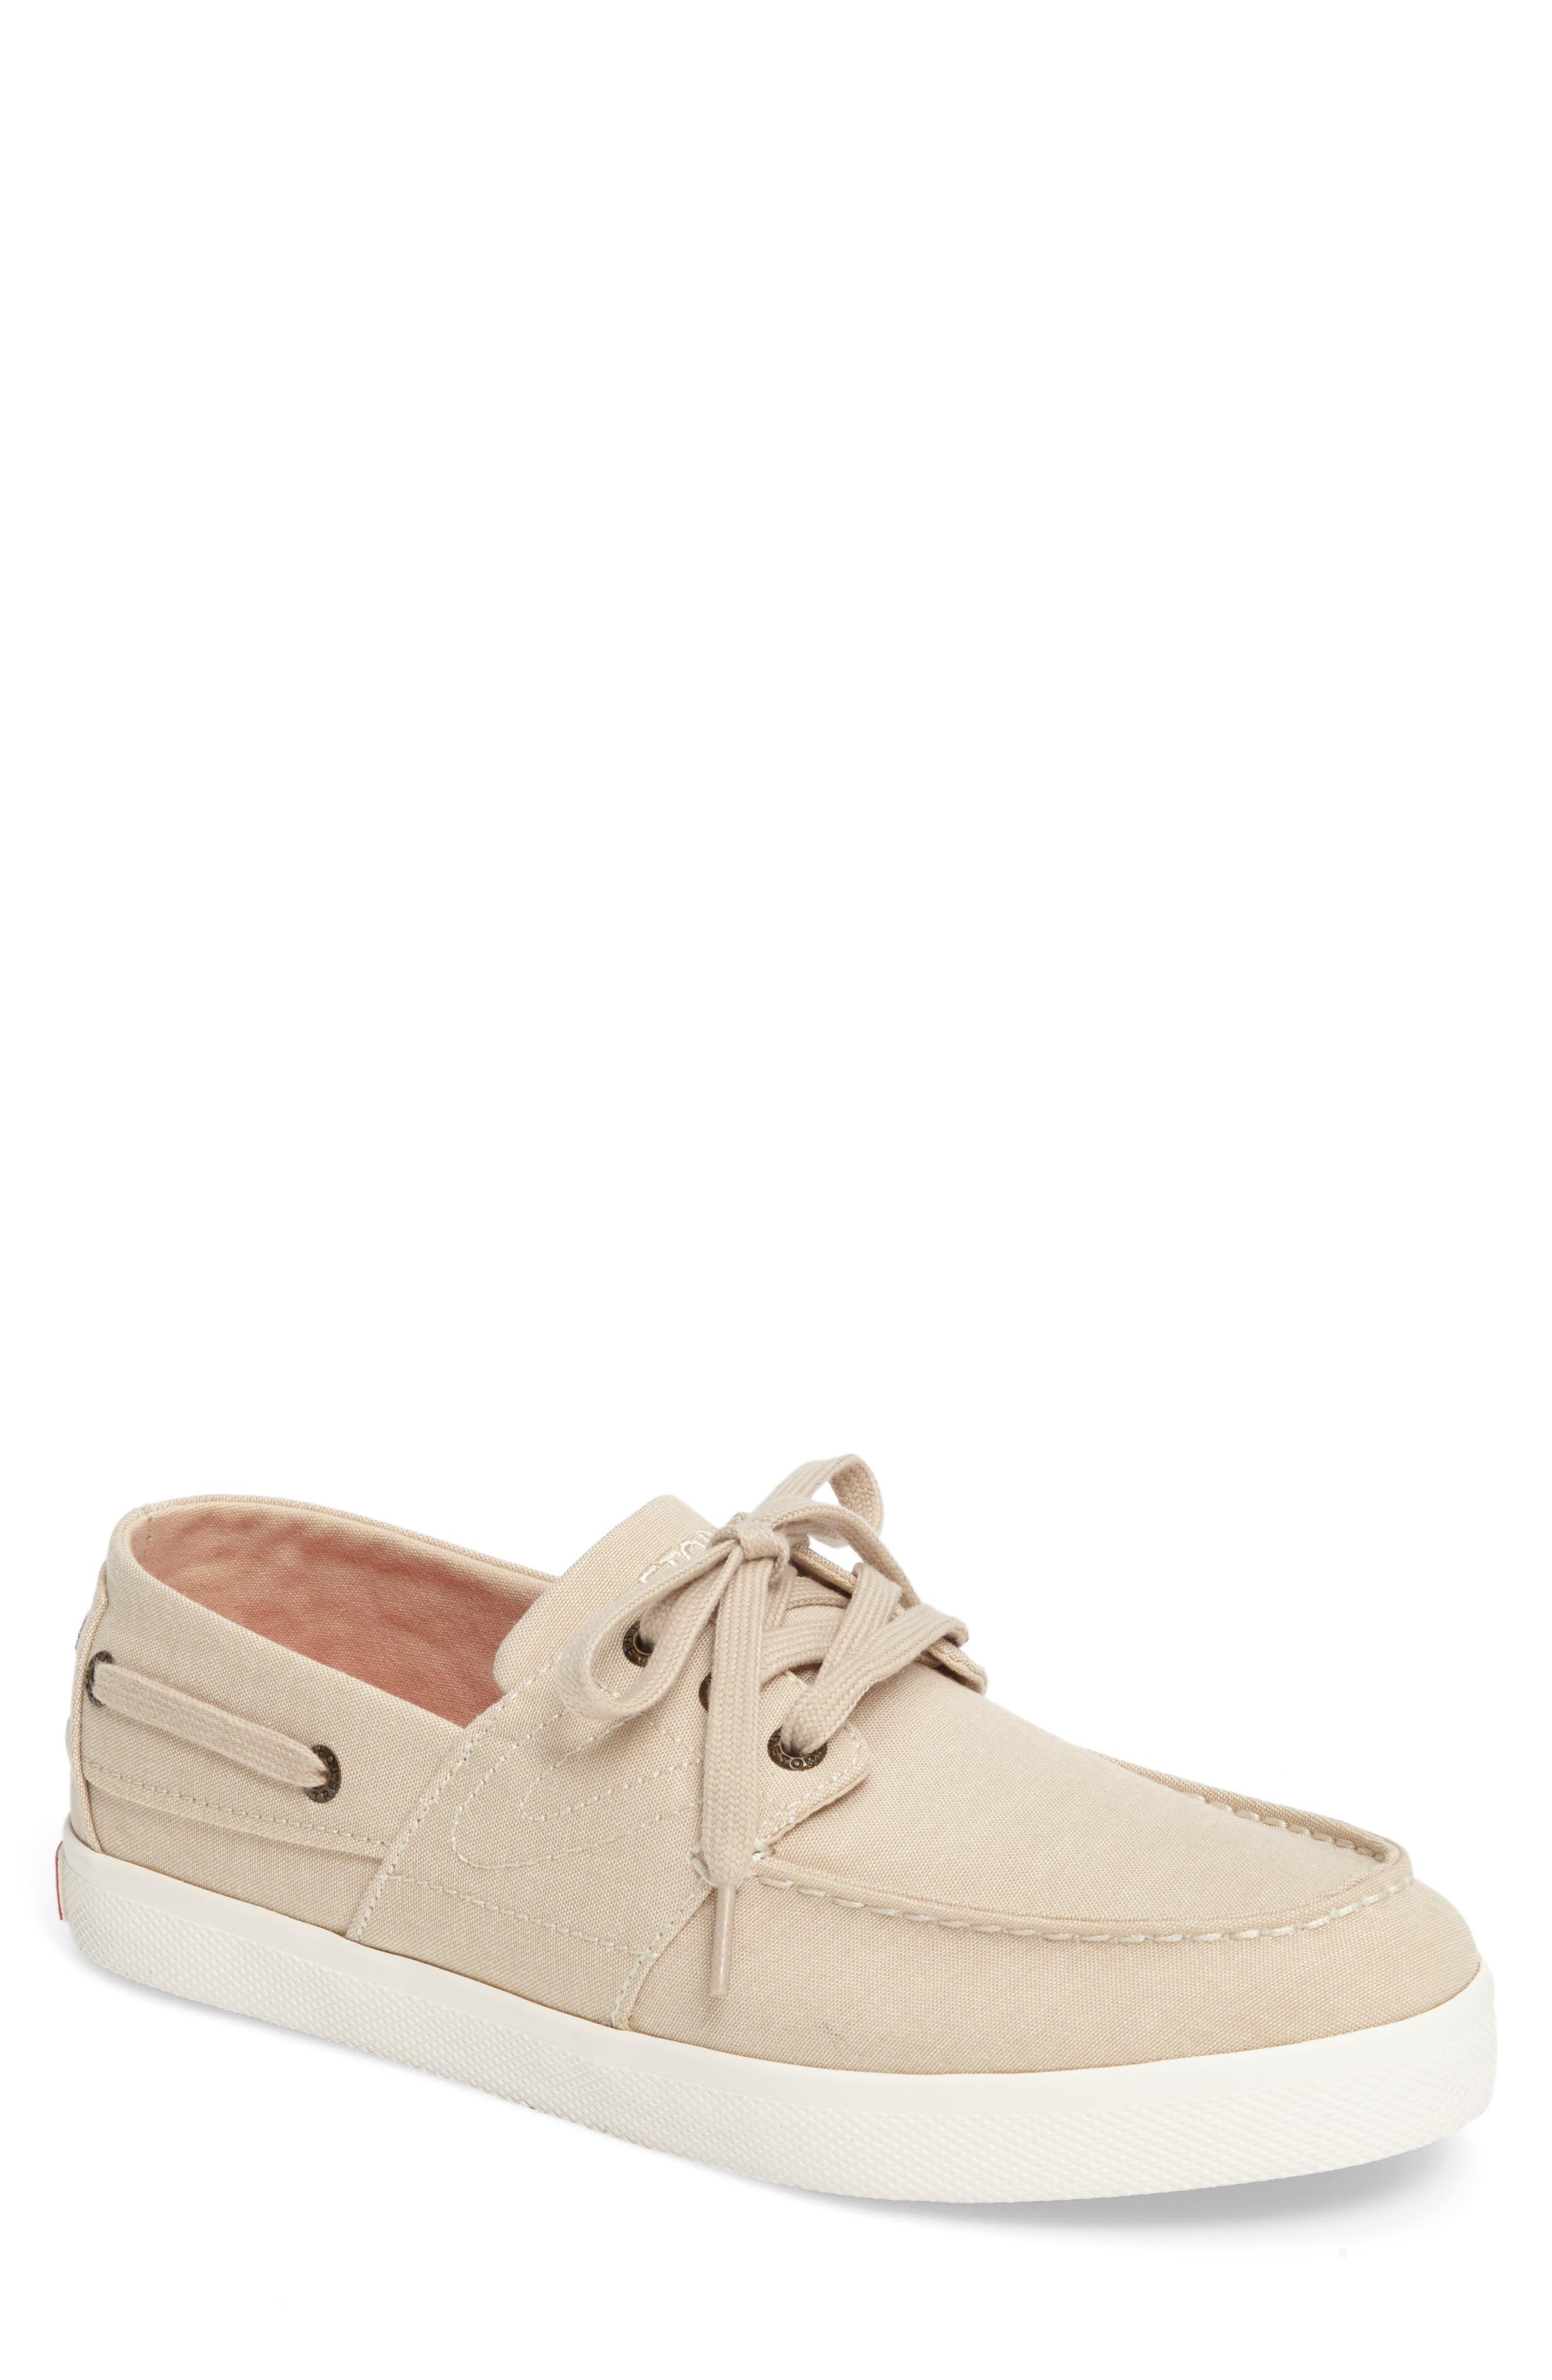 Tretorn Motto Boat Shoe (Men)